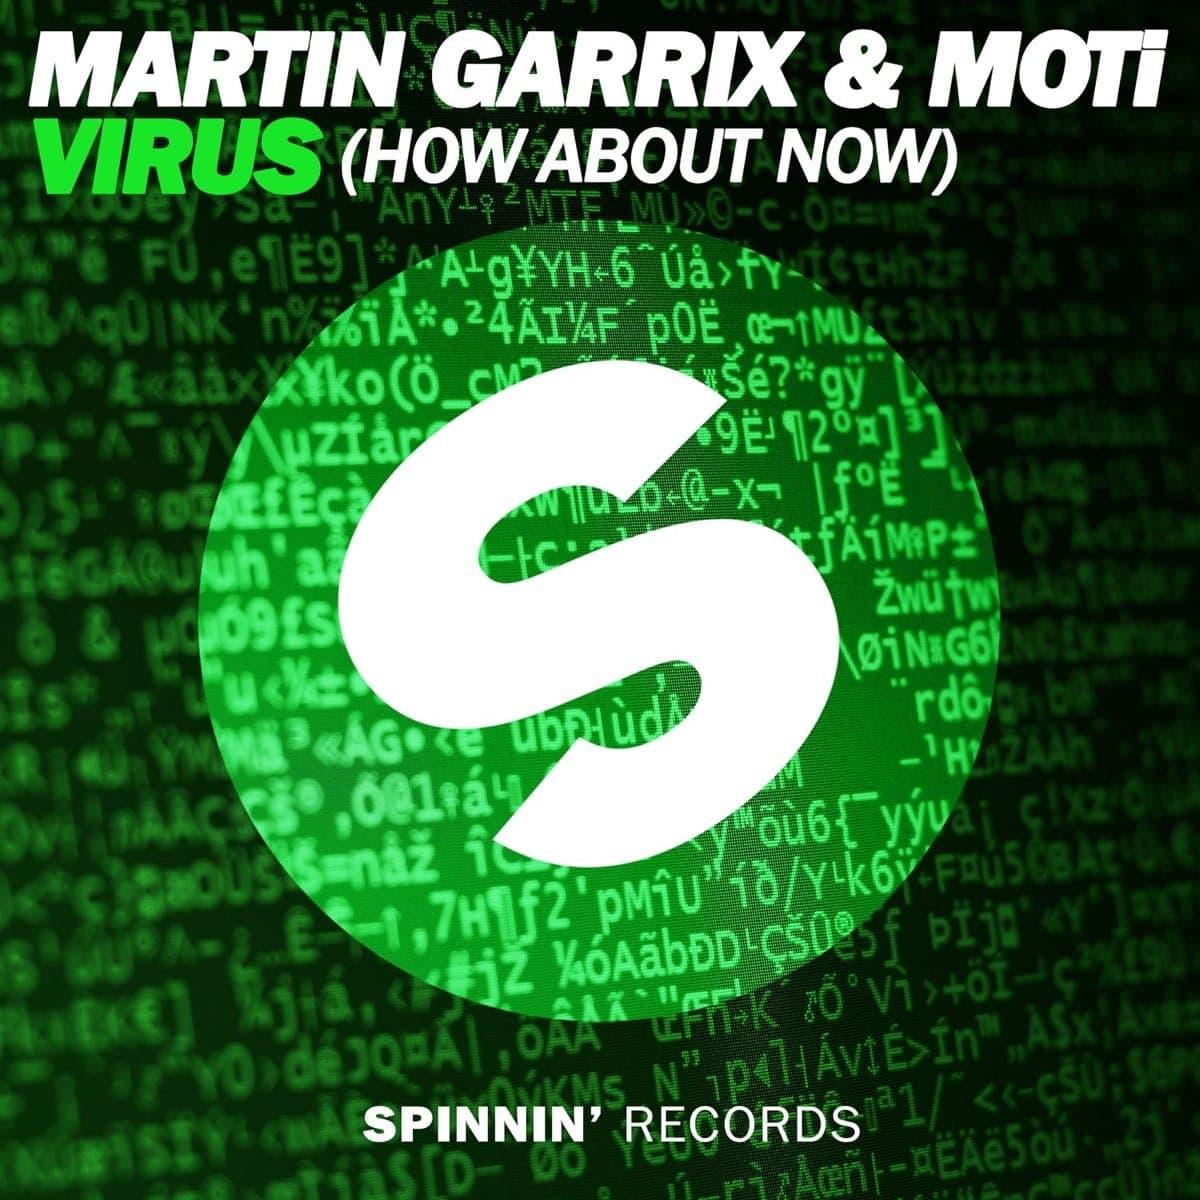 Virus (How About Now) - Martin Garrix & Moti